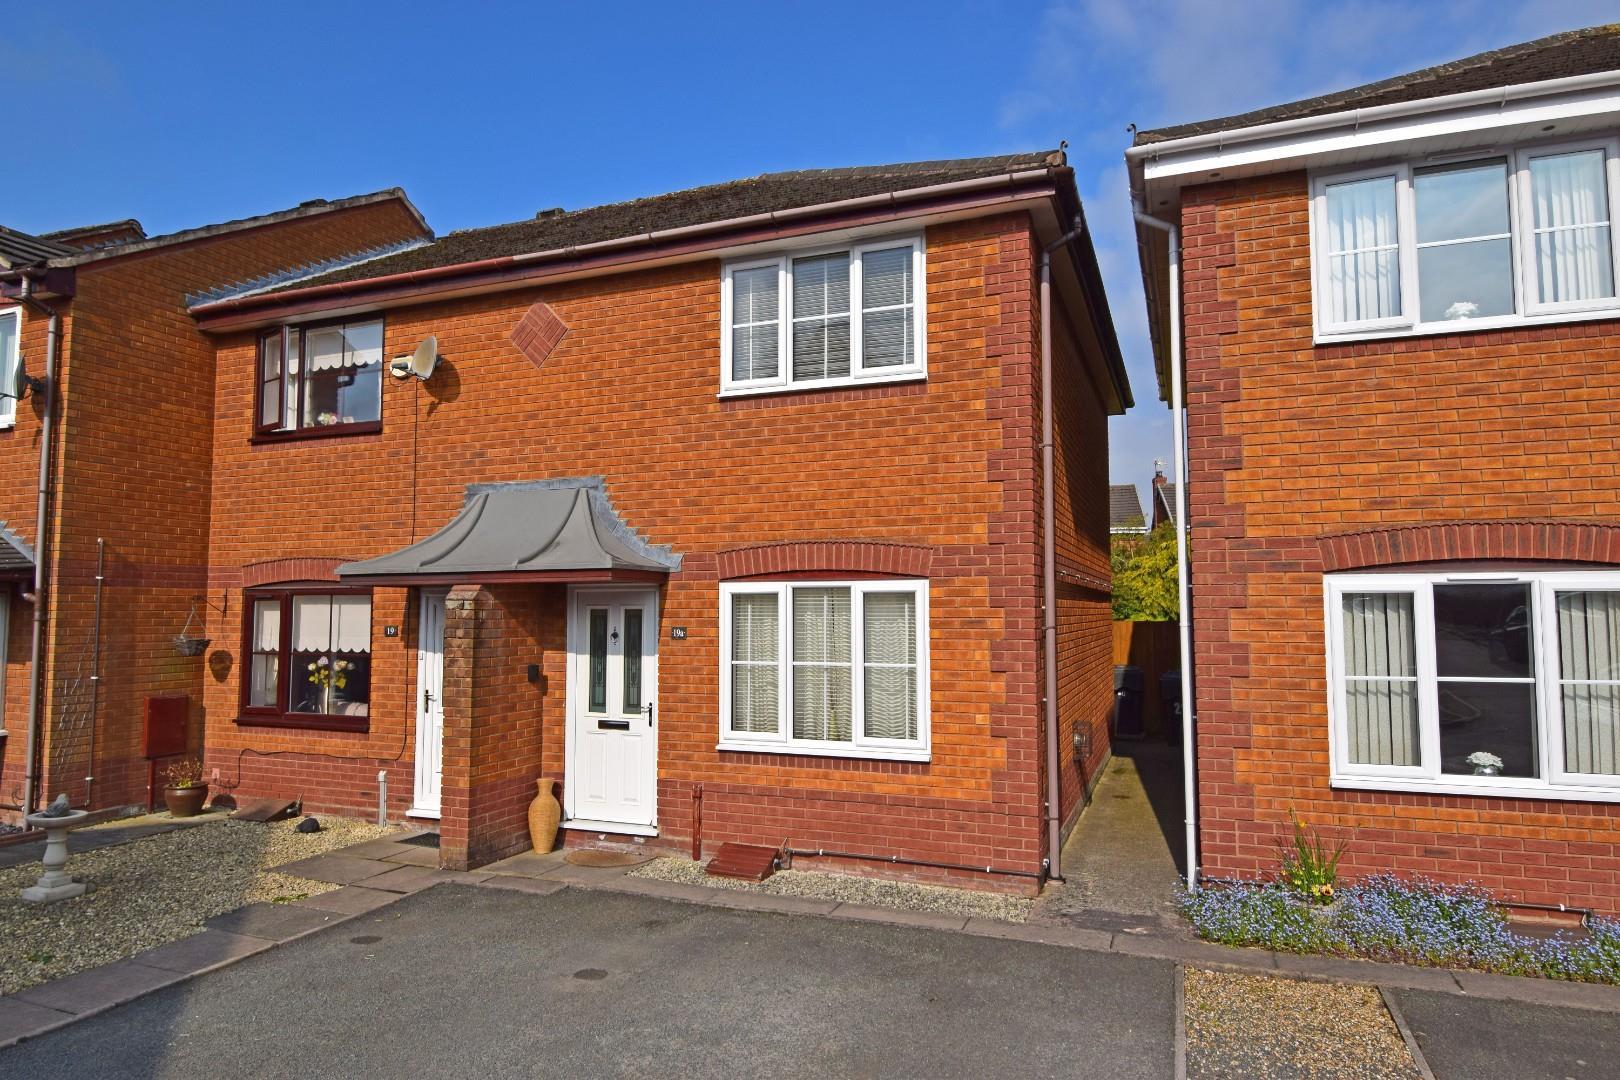 19a Crabtree Drive, Bromsgrove, Worcestershire, B61 8NX